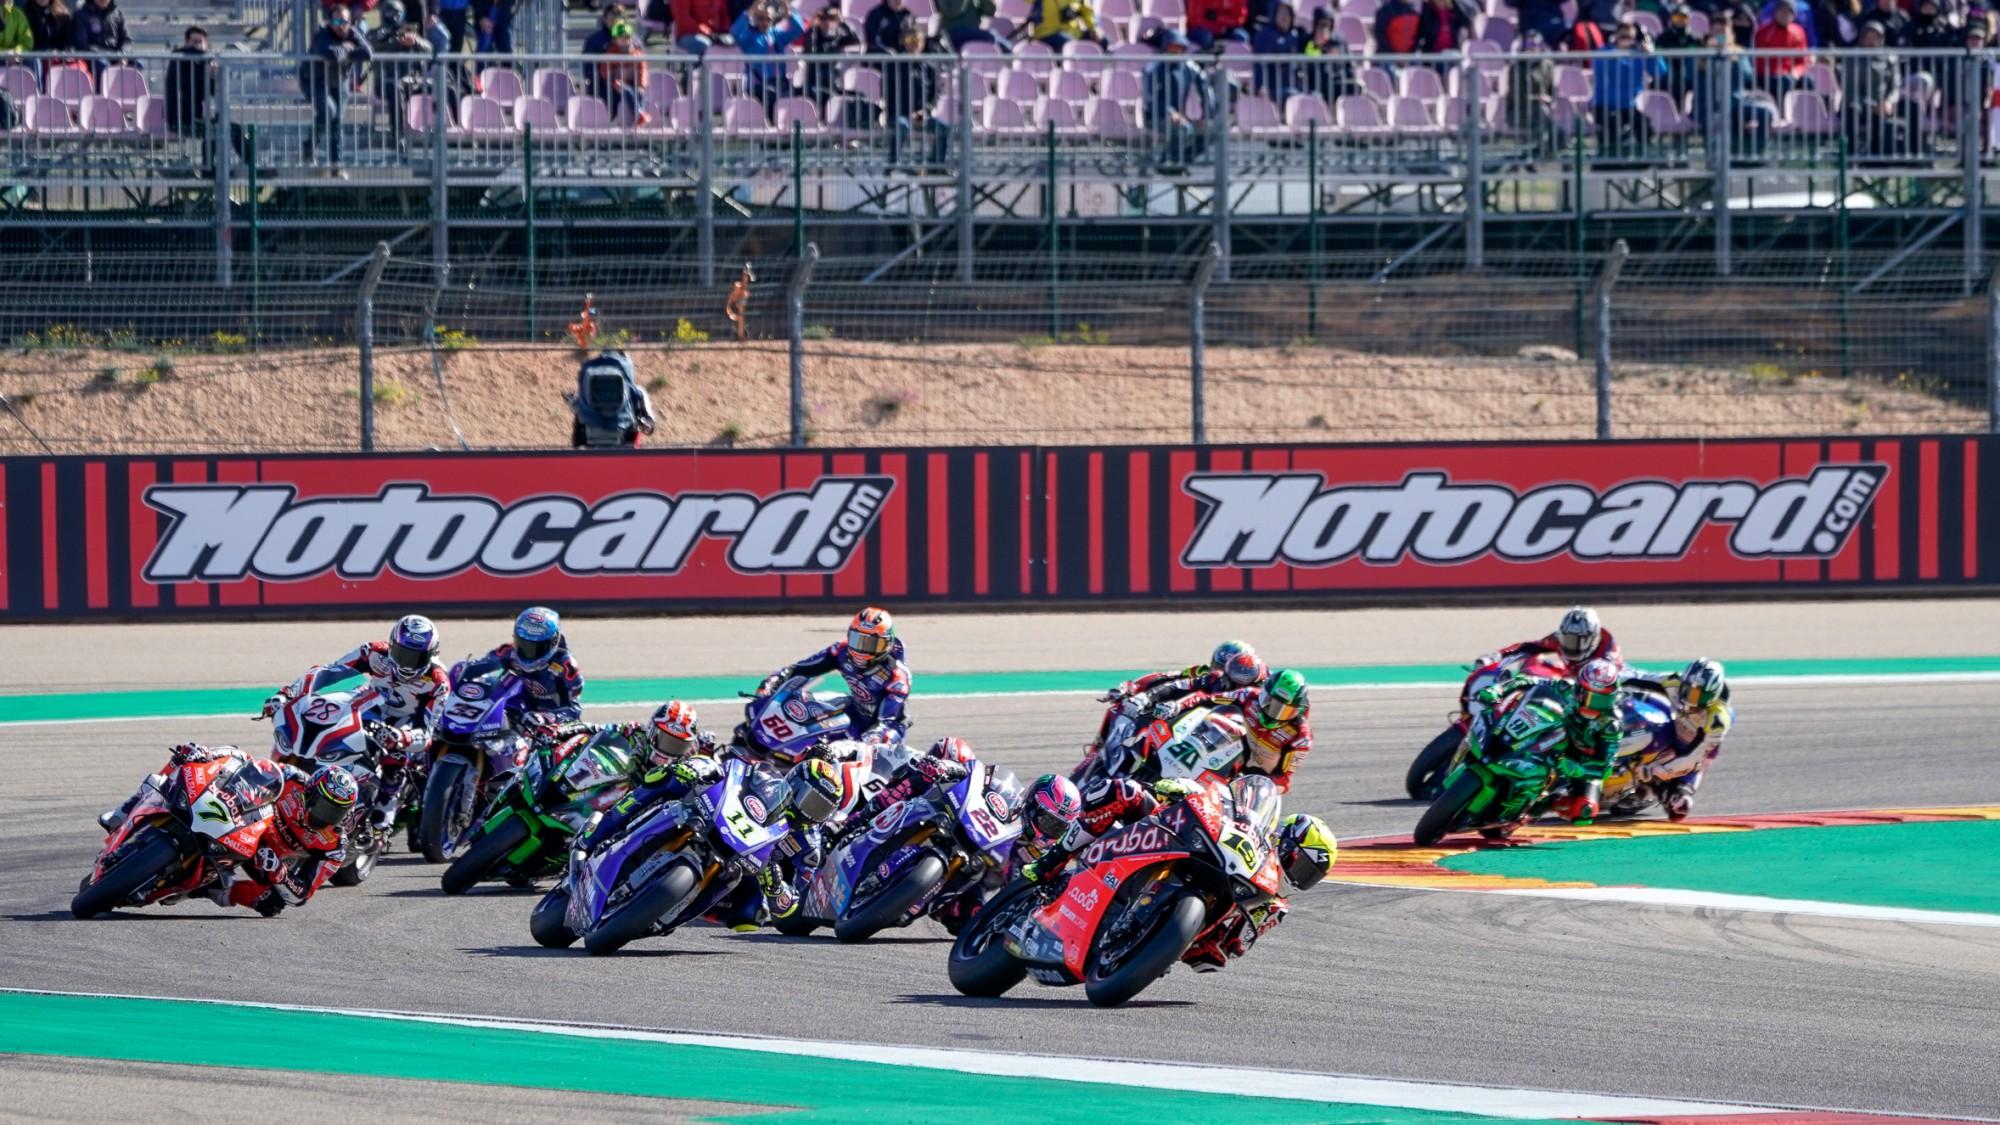 WSBK 2019 Motocard Aragon Round_3